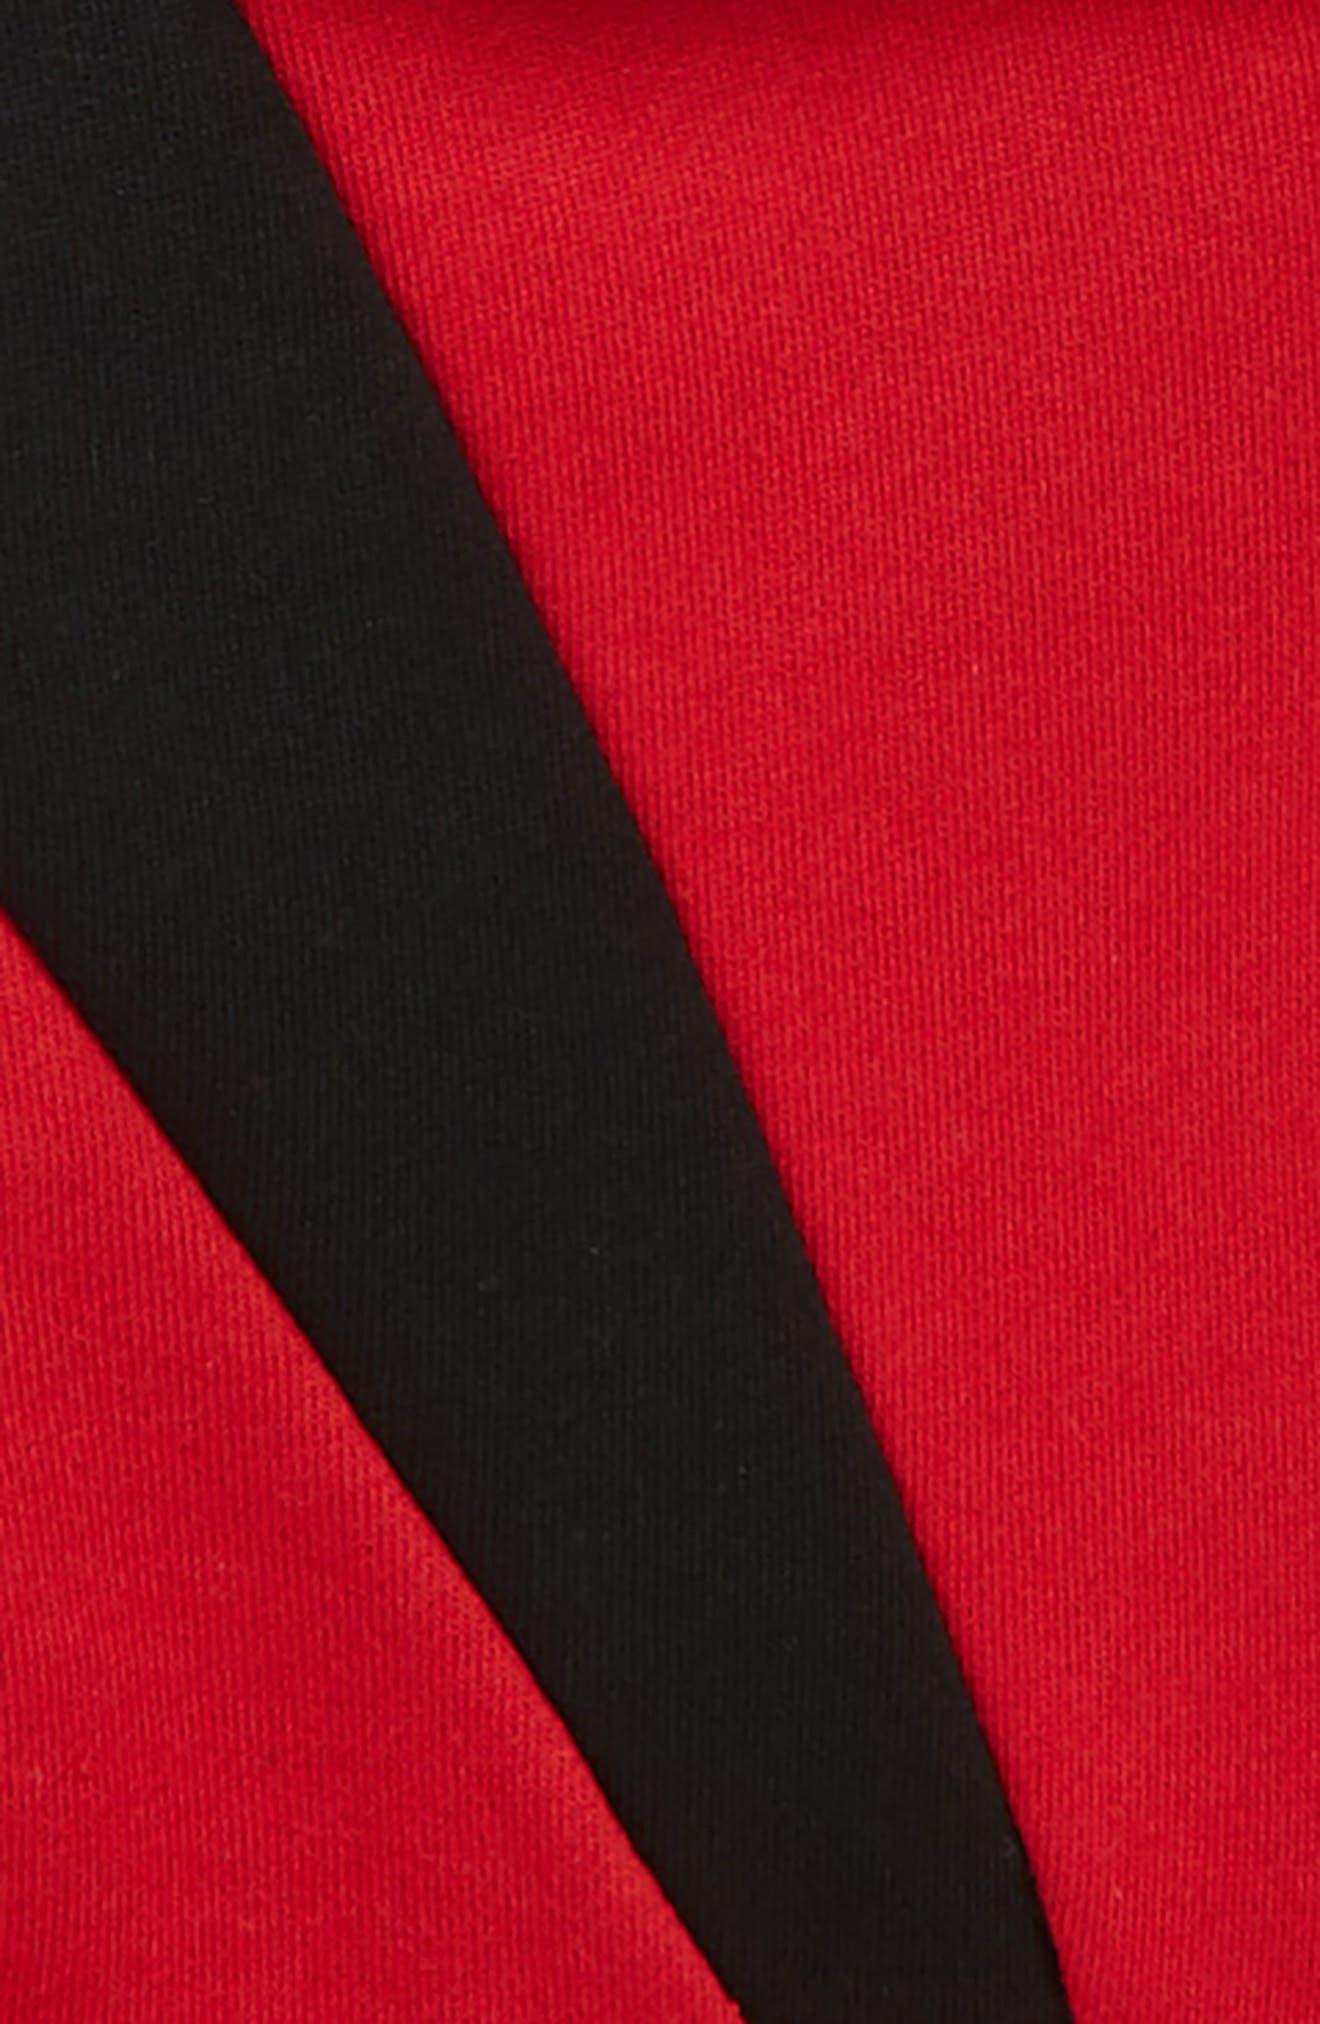 JORDAN, Flight 5 Hooded Sweatshirt, Alternate thumbnail 2, color, GYM RED